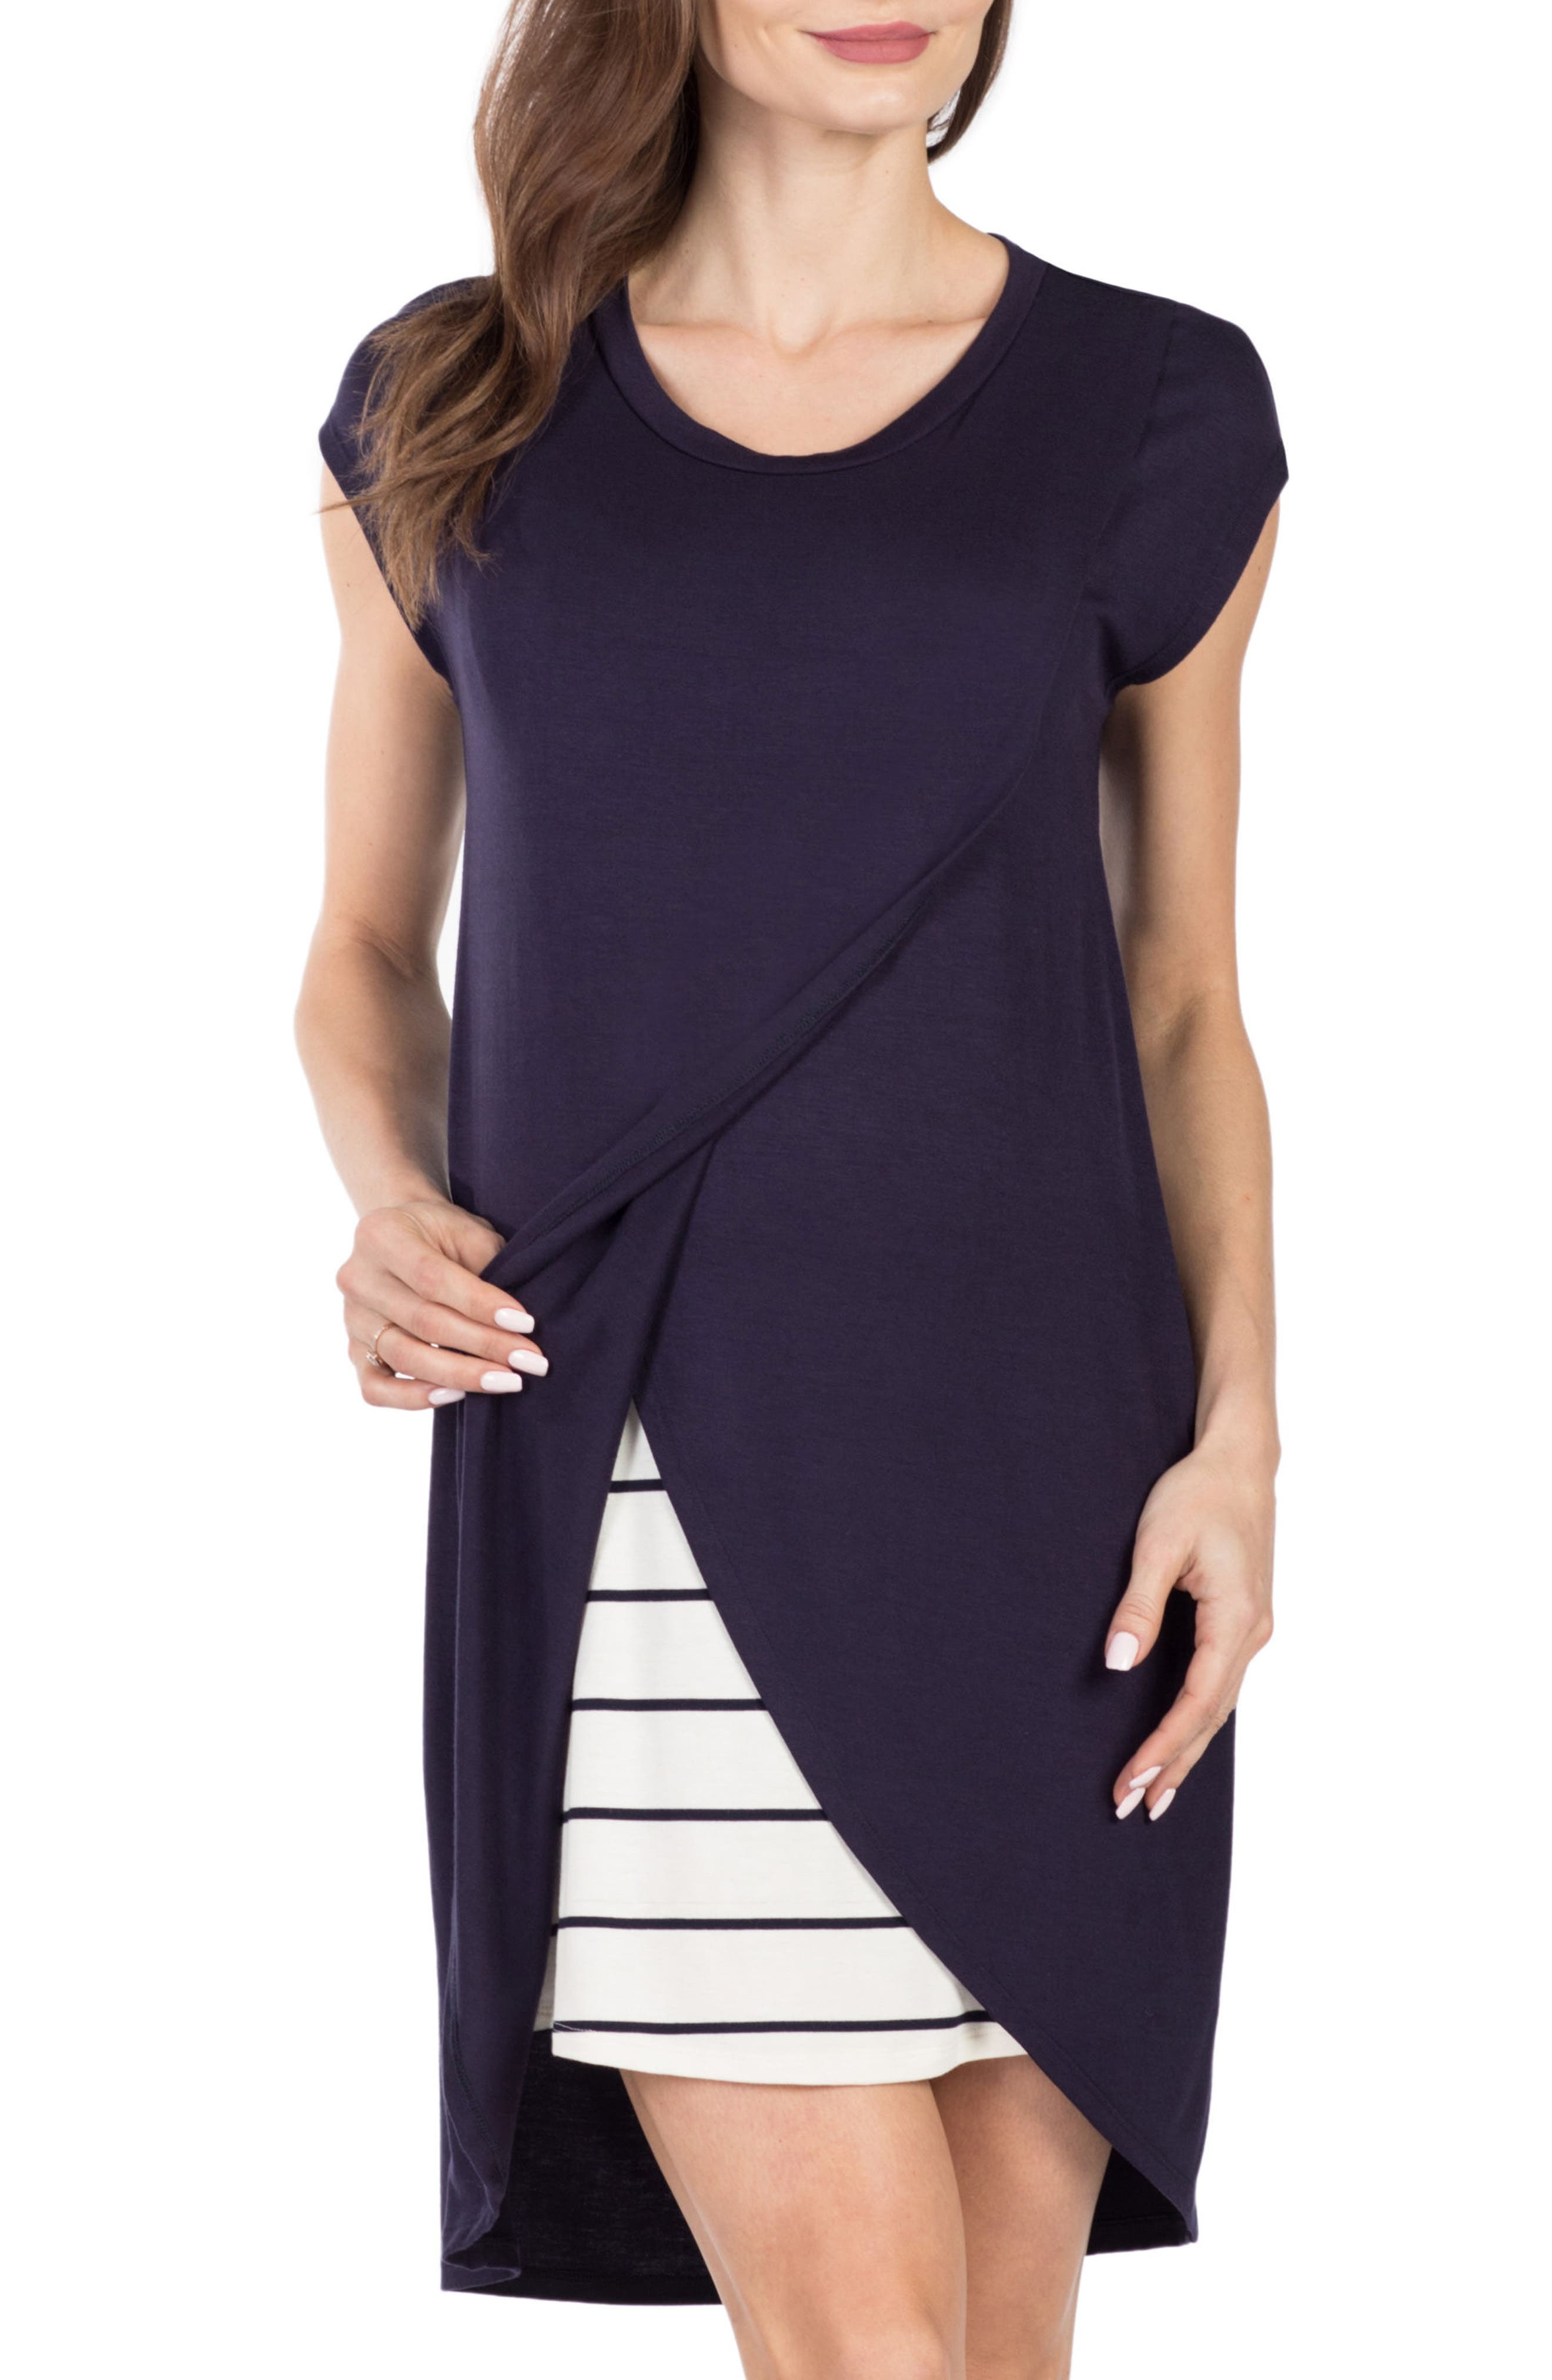 Lille Layered Maternity/Nursing Sheath Dress,                             Alternate thumbnail 3, color,                             NAVY/ WHITE STRIPE